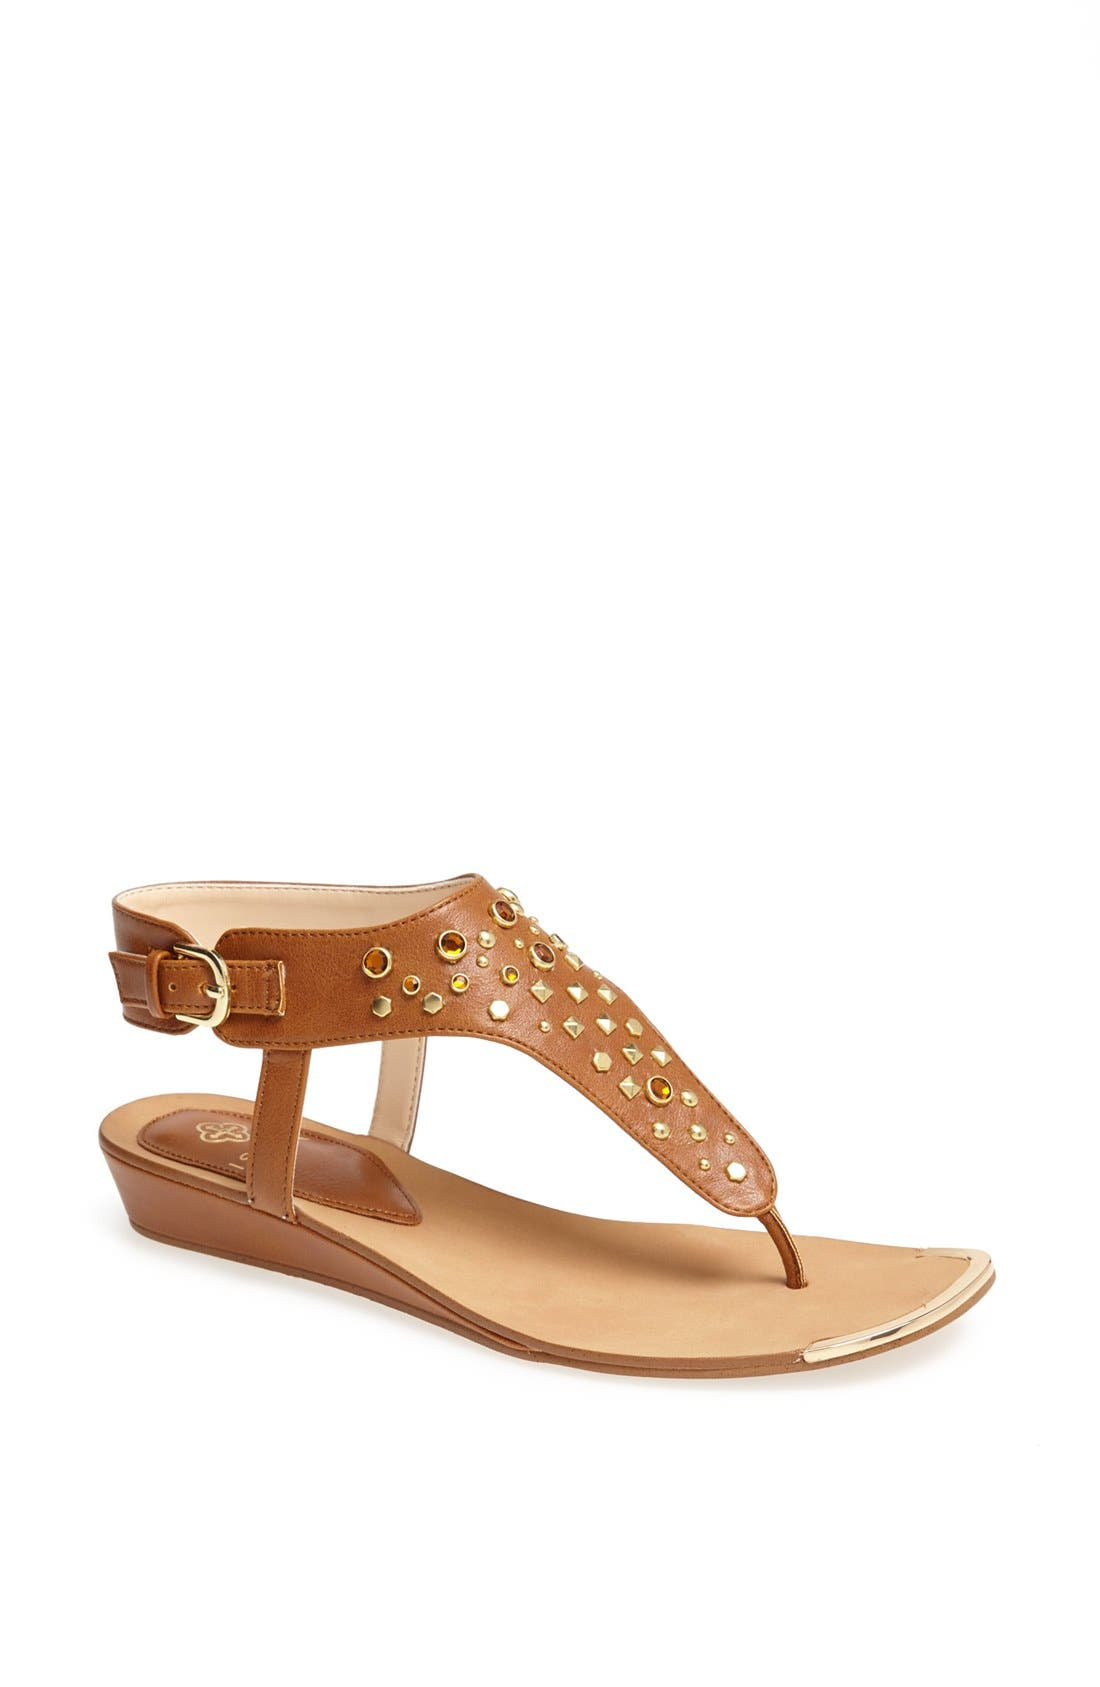 Alternate Image 1 Selected - Isolá 'Anastasia' Sandal